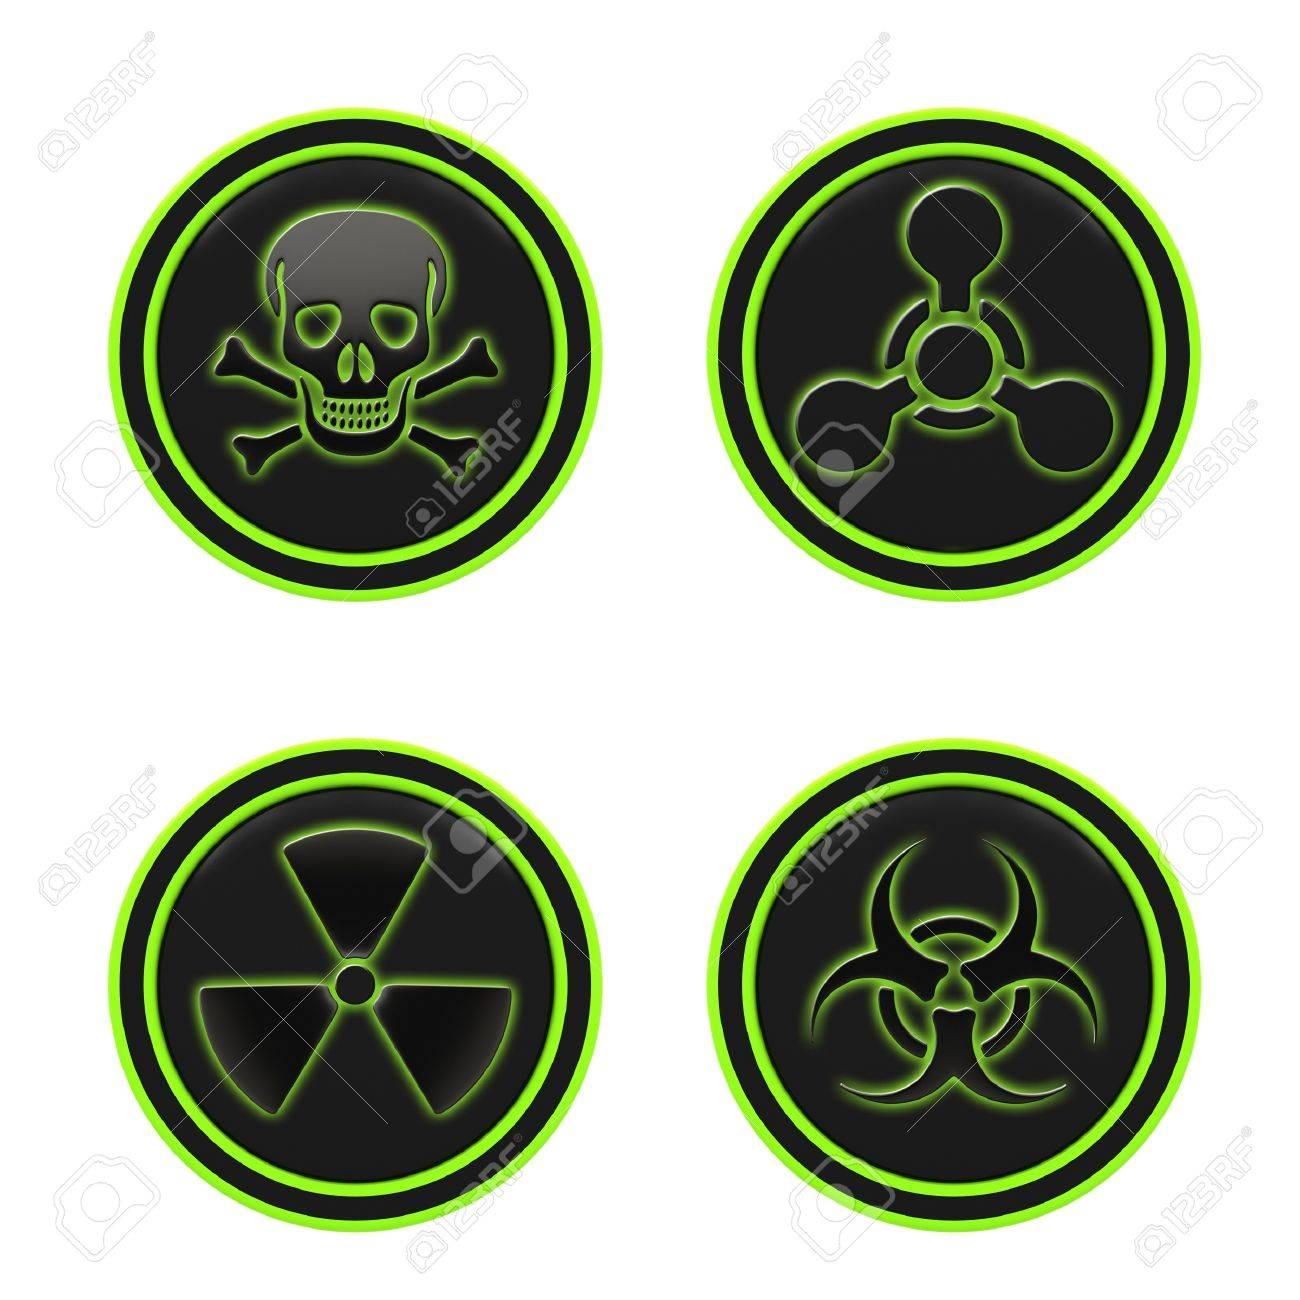 Icon Depicting The Hazard Symbols On A White Background Stock Photo